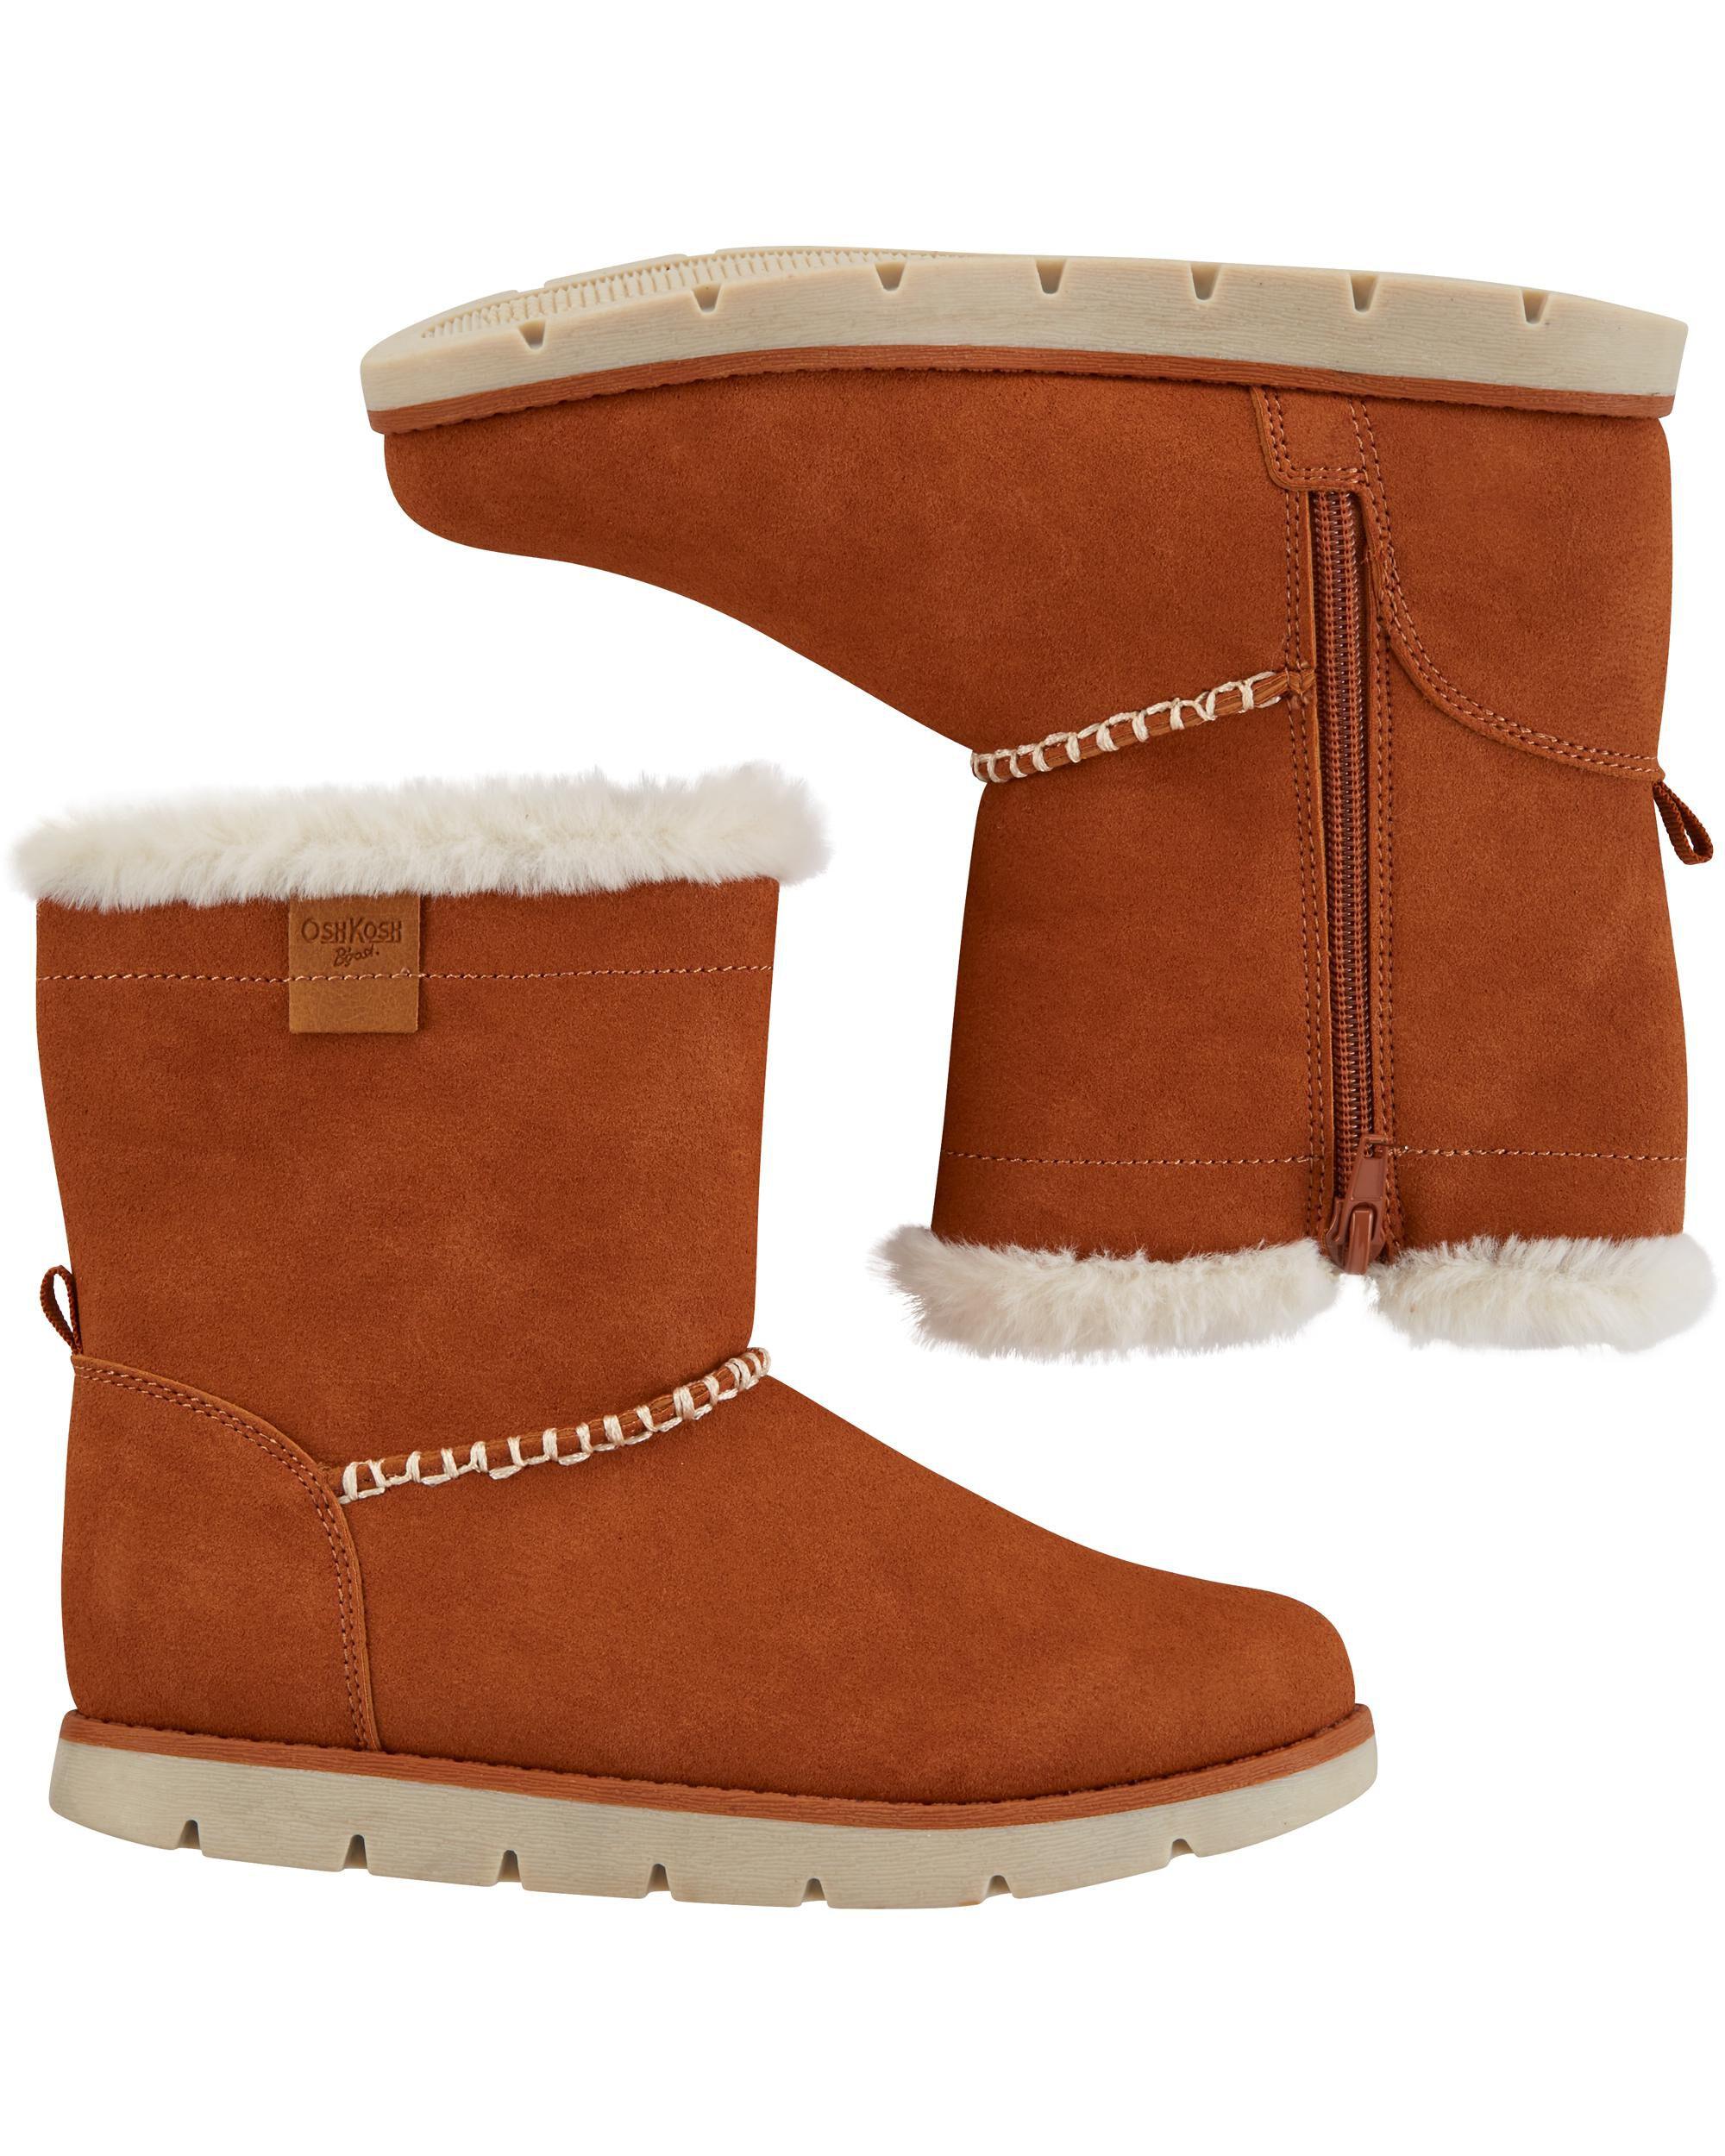 *DOORBUSTER*Furry-Lined Boots